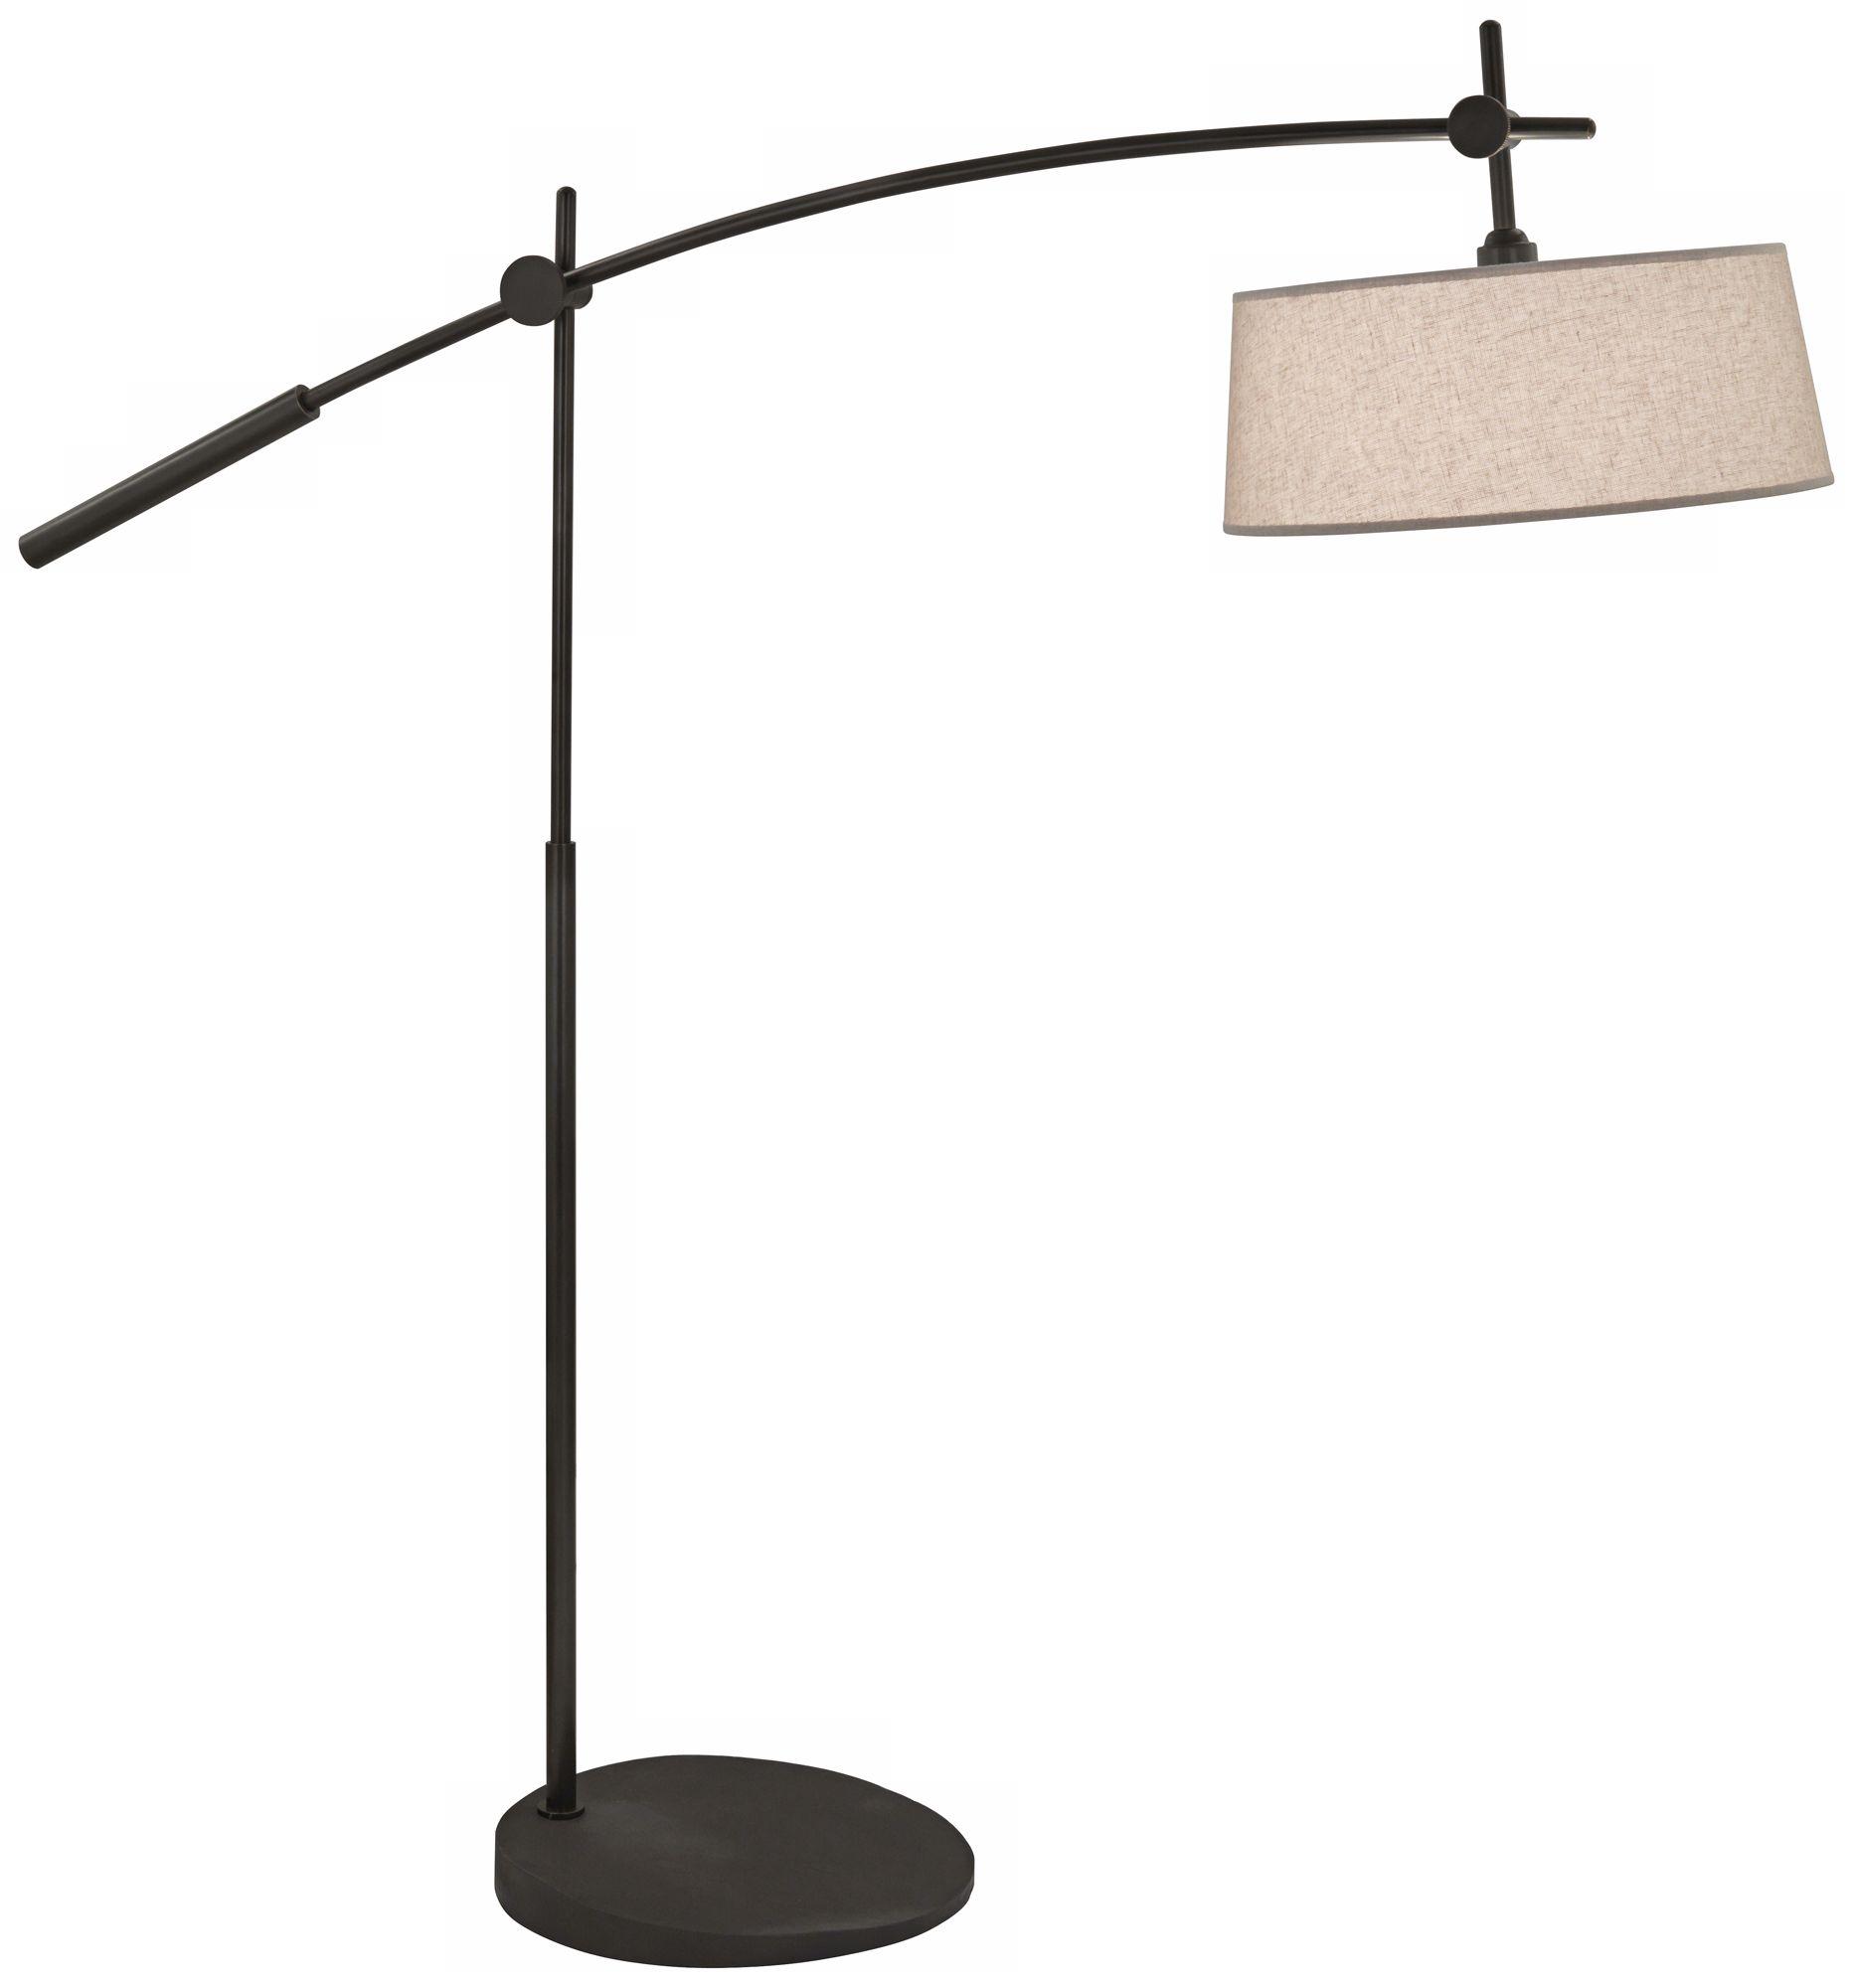 rico espinet miles 2light boom patina bronze floor lamp - Arc Lamps